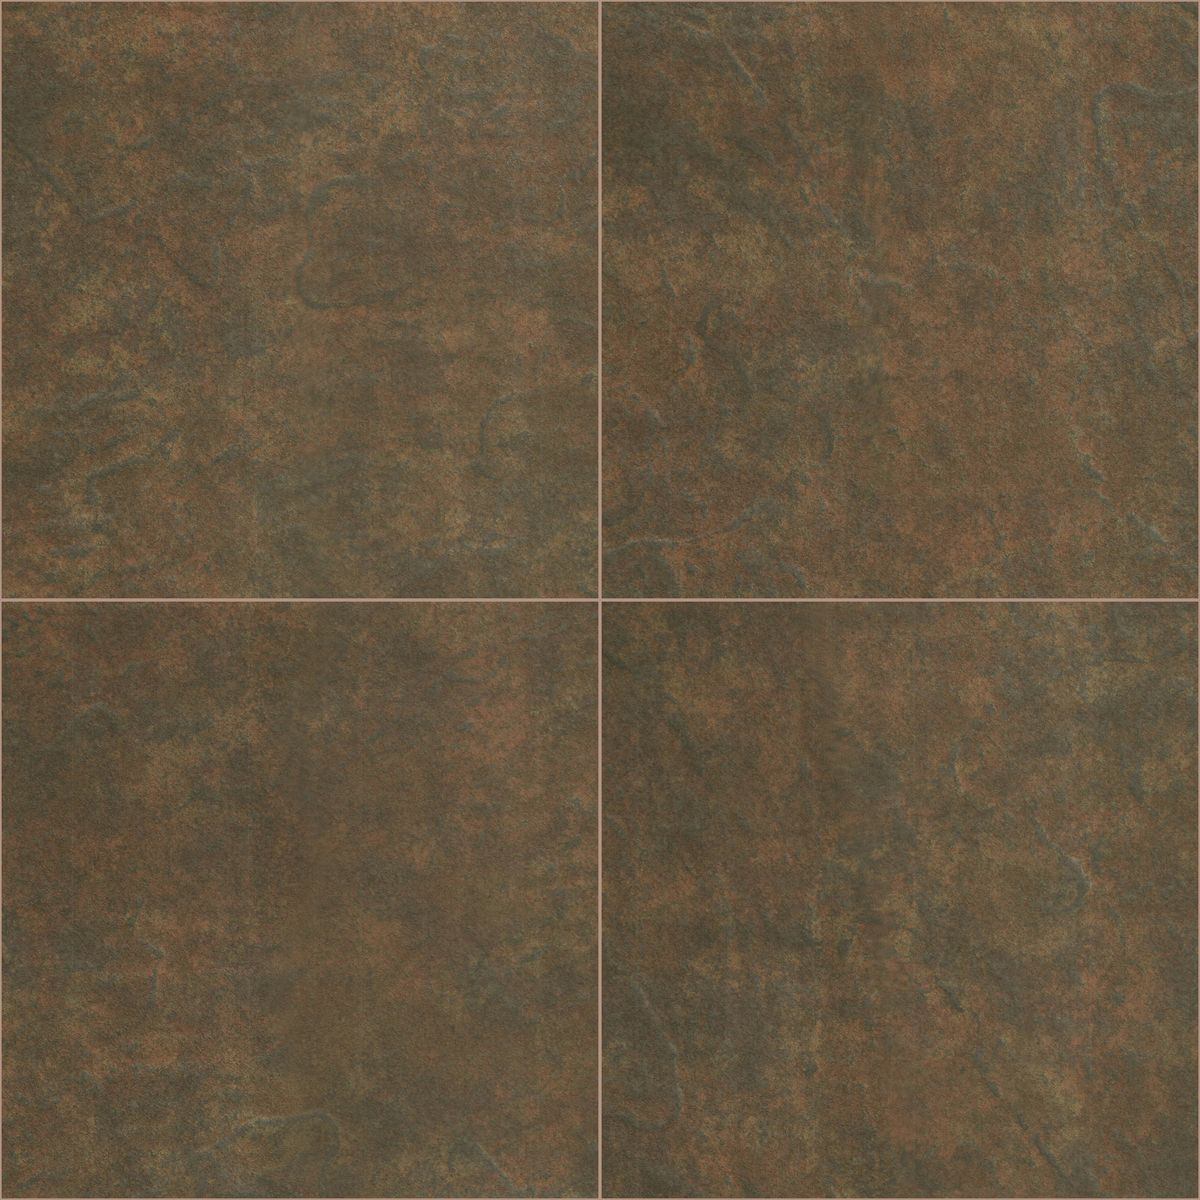 Nice 12 X 12 Ceramic Tile Small 12X12 Vinyl Floor Tile Rectangular 12X24 Floor Tile Patterns 24 X 48 Ceiling Tiles Drop Ceiling Young 3 X 12 Subway Tile Pink3D Floor Tiles KWIK TILE 13x13 Sonora Grafito Easy Click Installation Ceramic ..